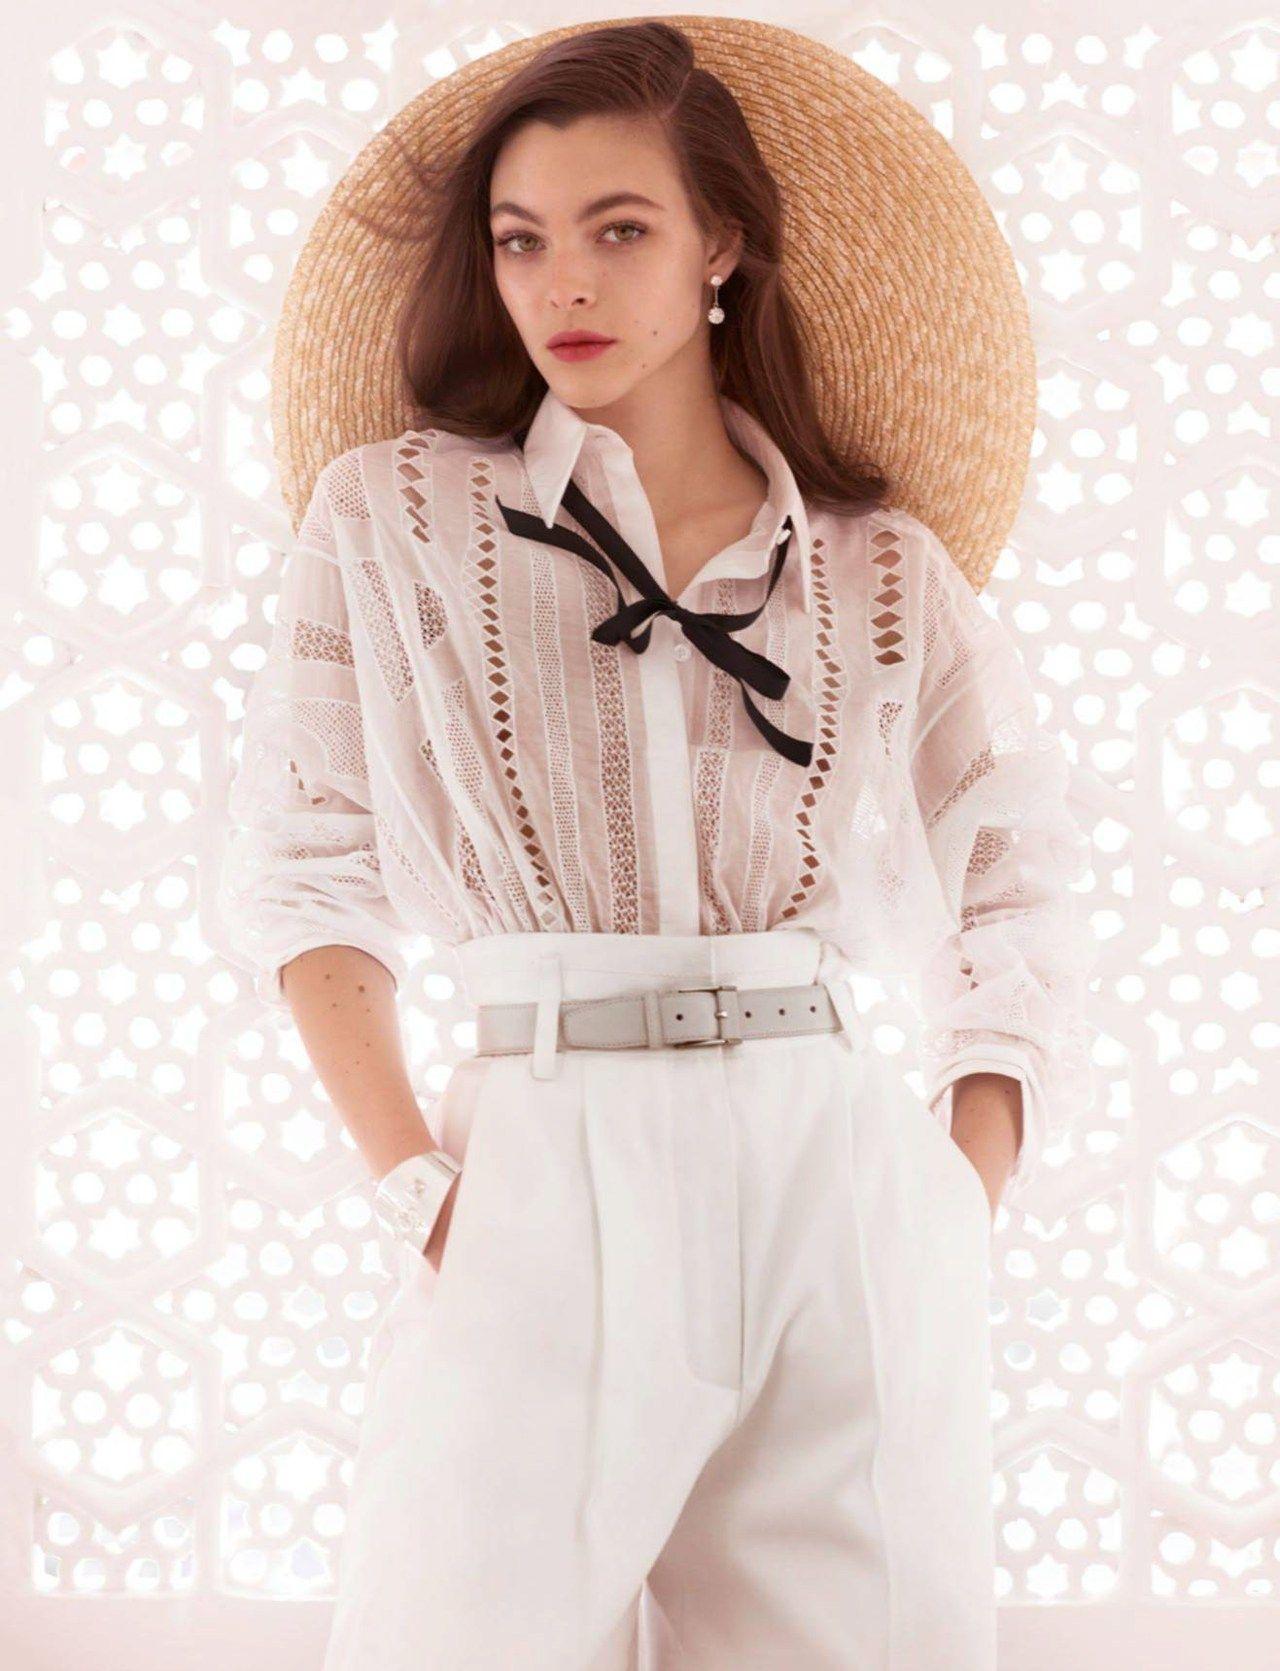 India Song Publication: Vogue Paris May 2017 Model: Vittoria Ceretti Photographer: Mario Testino Fashion Editor: Anastasia Barbieri Hair: Christiaan Make Up: Charlotte Tilbury PART I